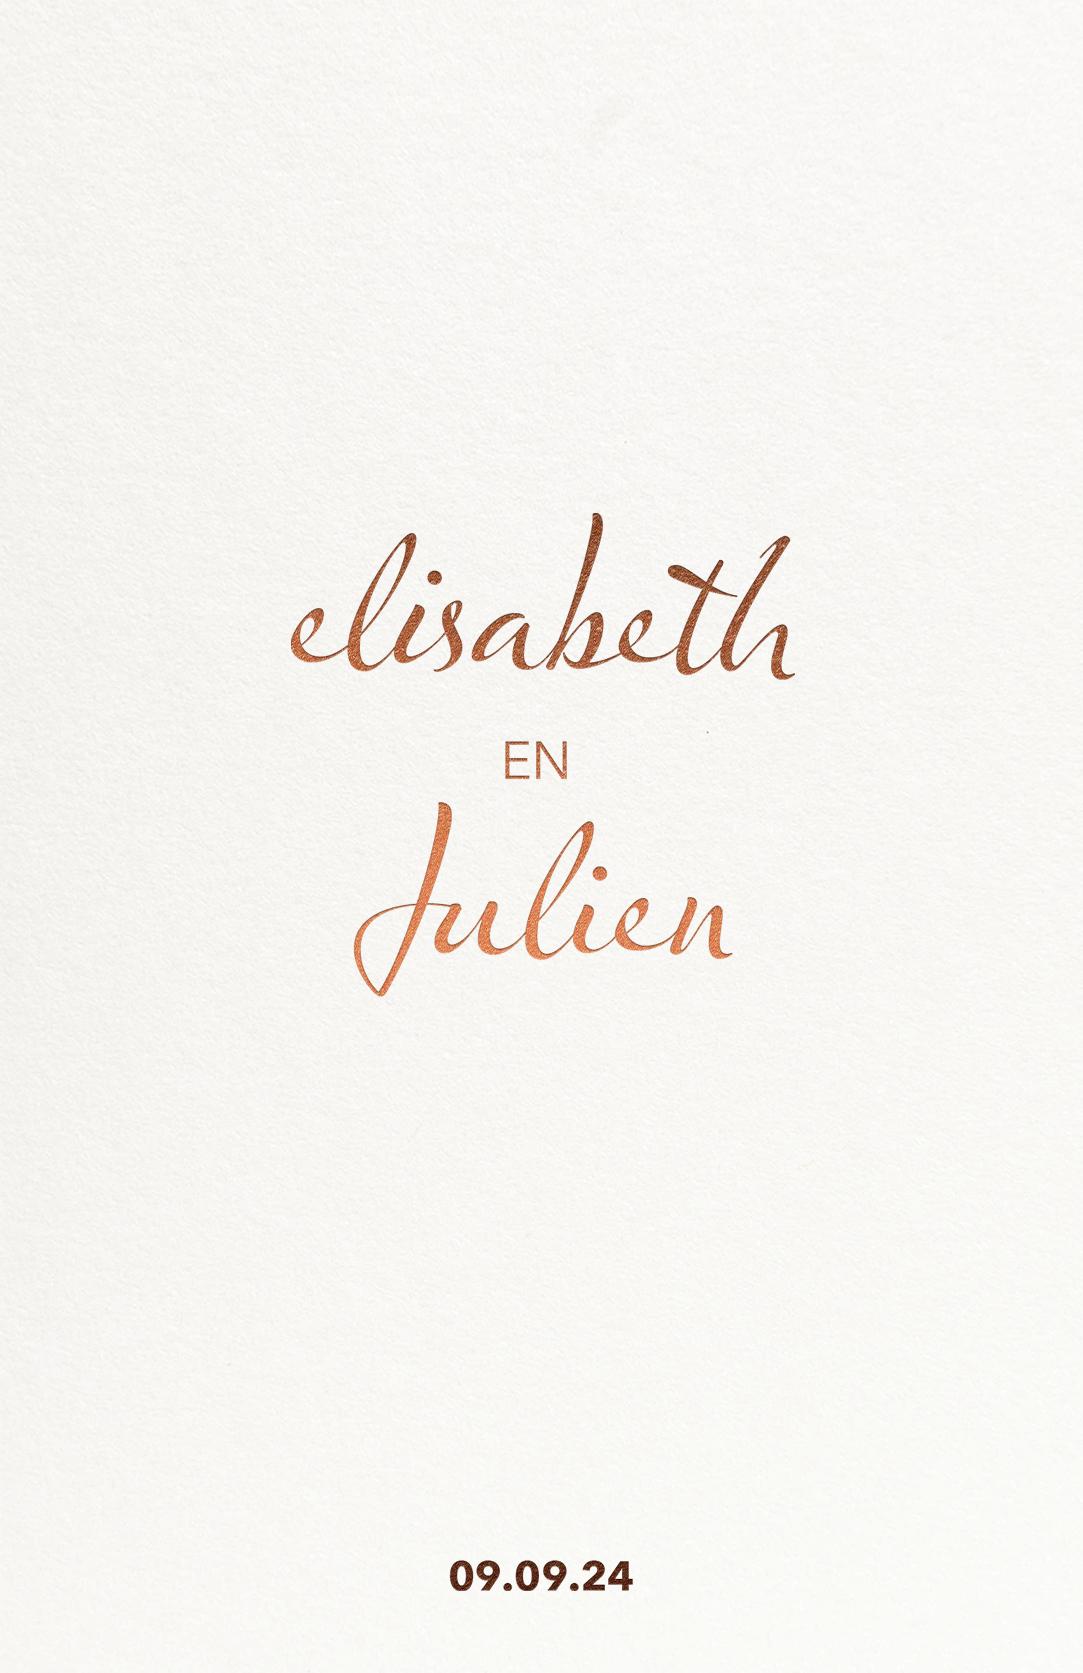 Trouwkaart Strak Minimalistisch Crème Wit Folie Glanzend Goud Groen Koper Luxe